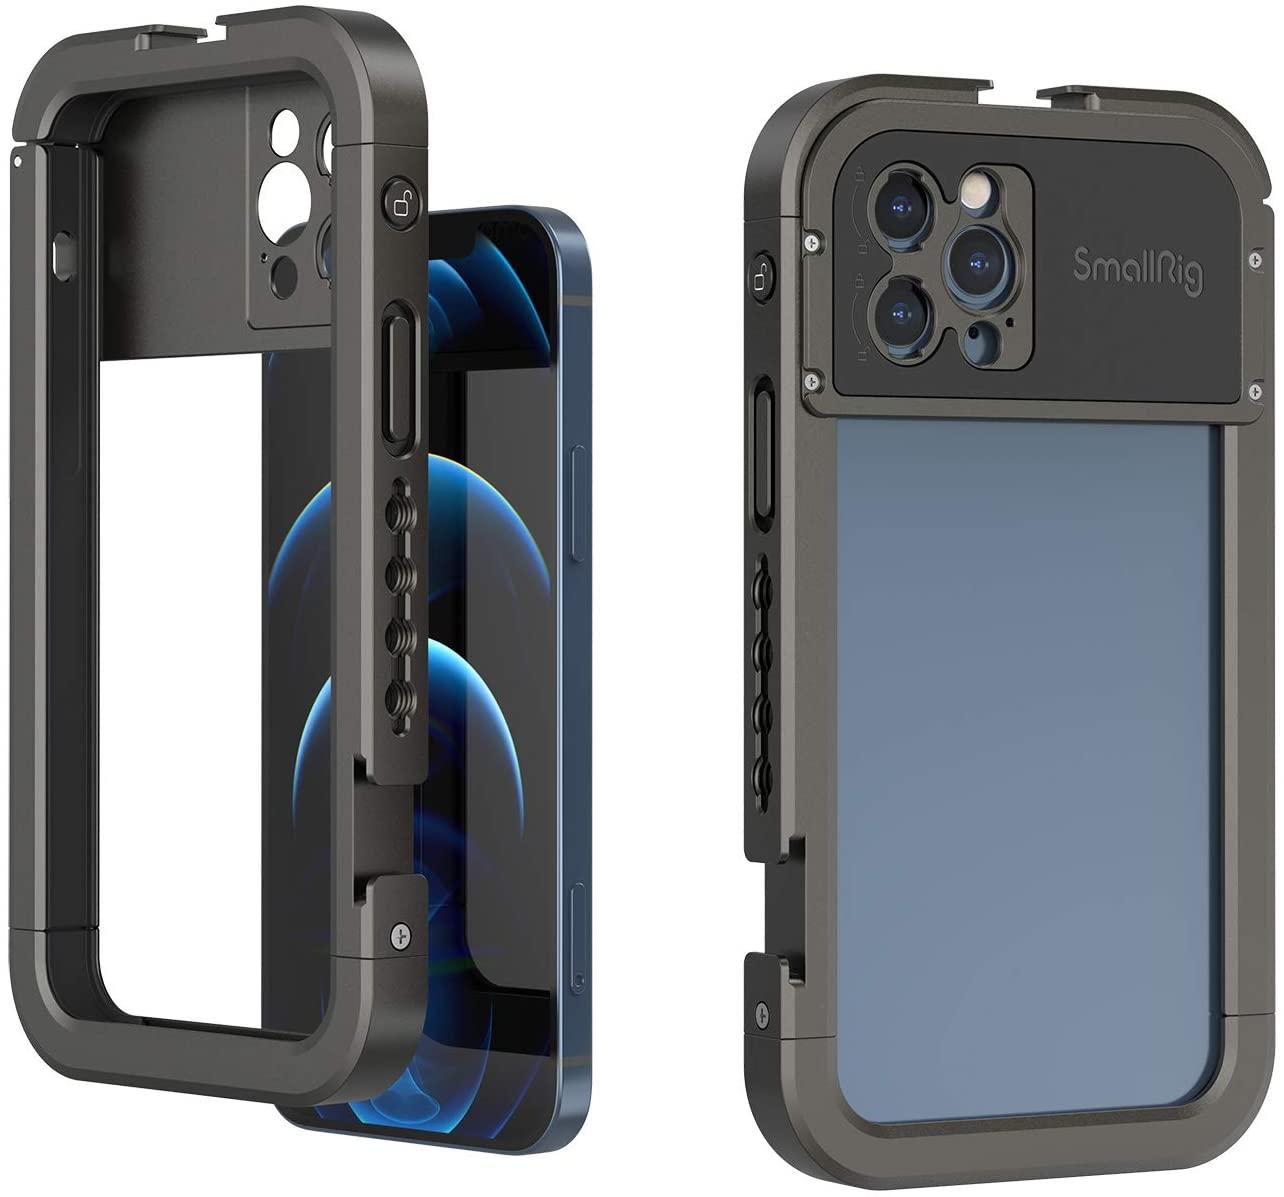 Smallrig iPhone 12 Pro Camera Cage Giveaway Image